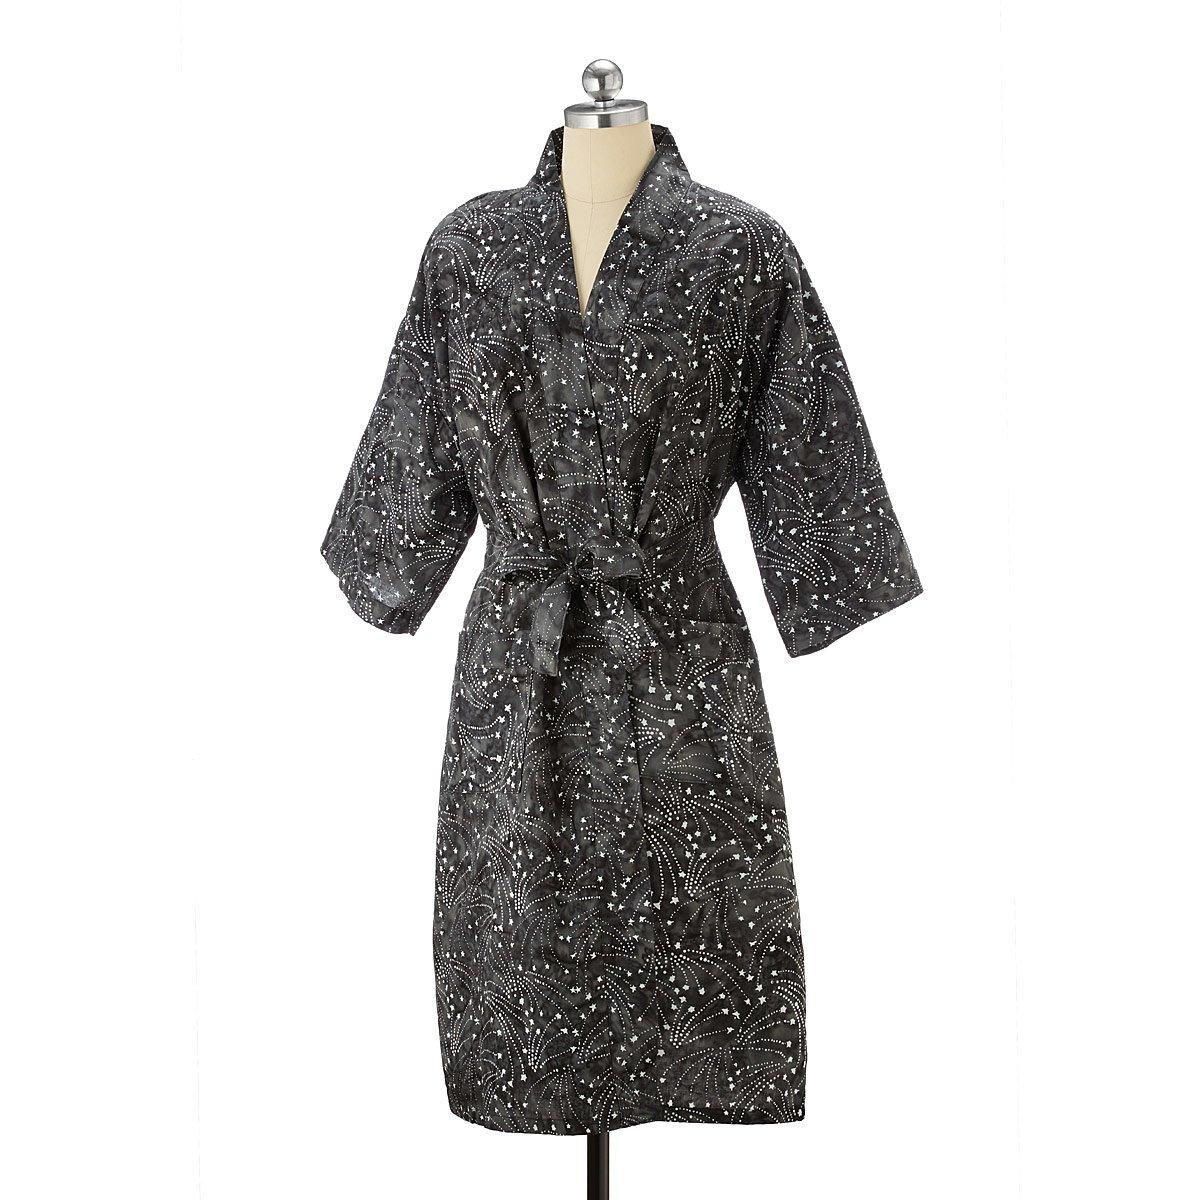 Shooting Star Kimono Robe | UncommonGoods